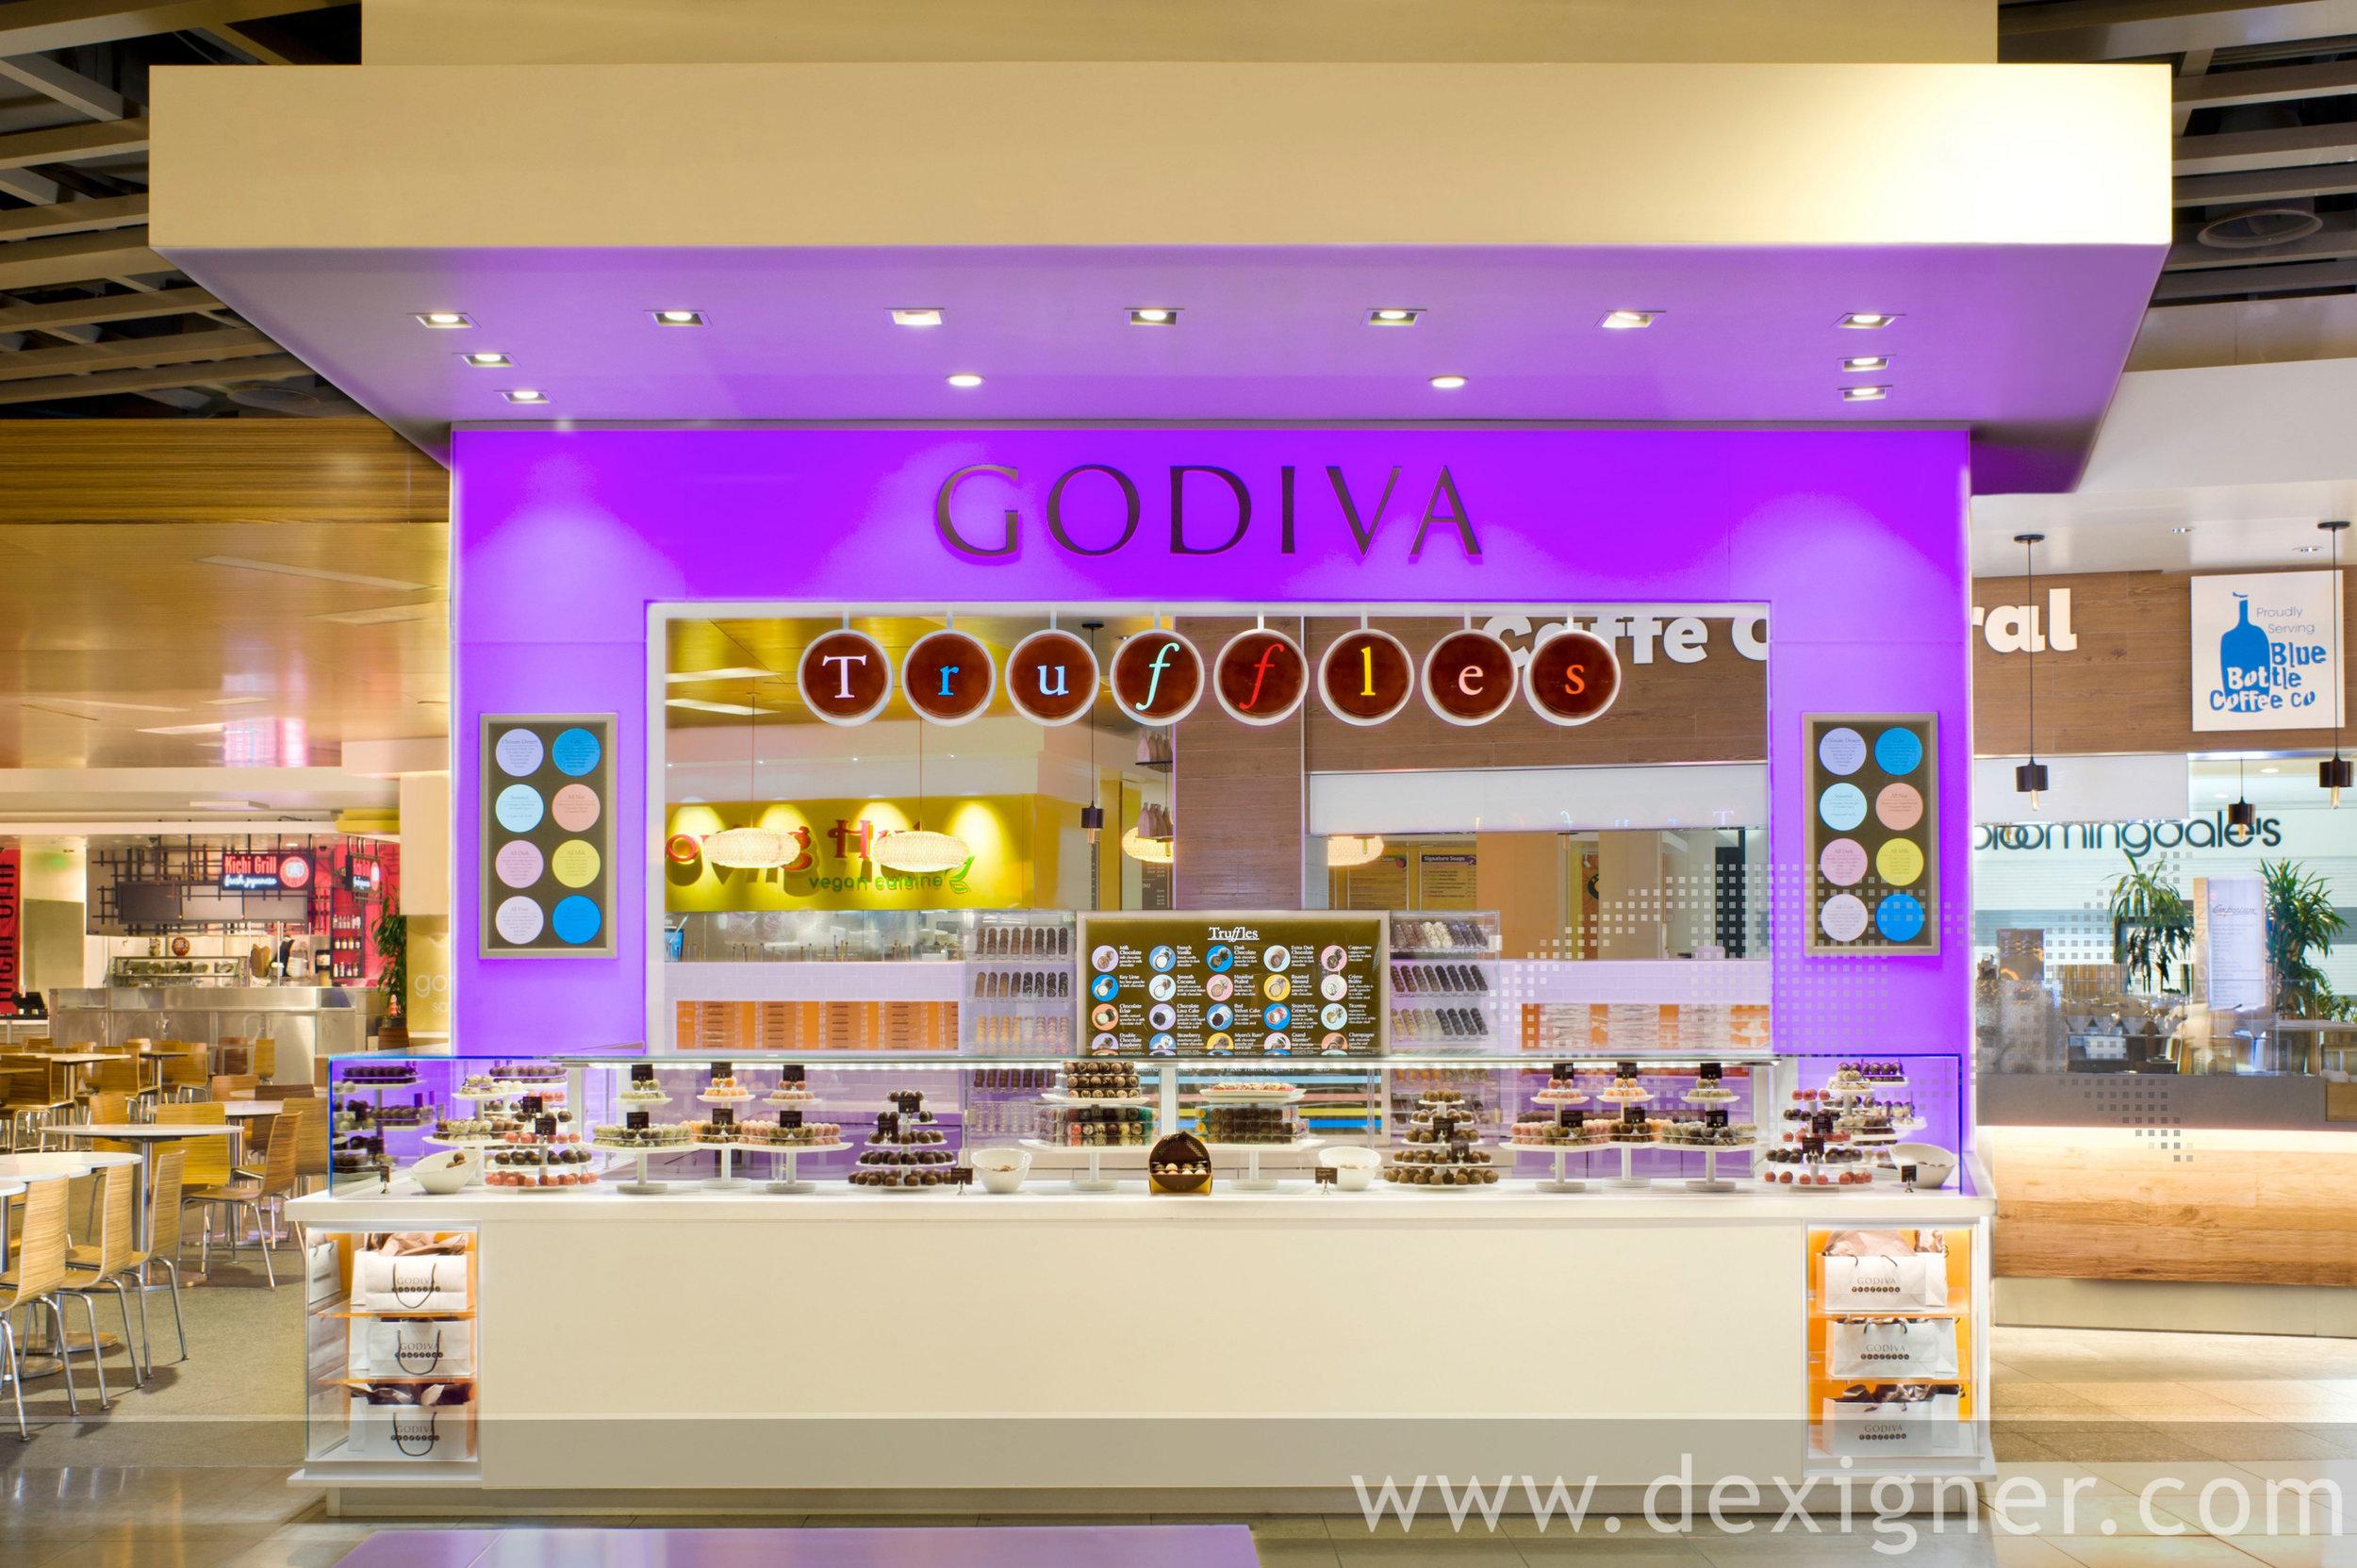 Godiva_Truffle_Express_Chocolate_Kiosk_01_c.jpg